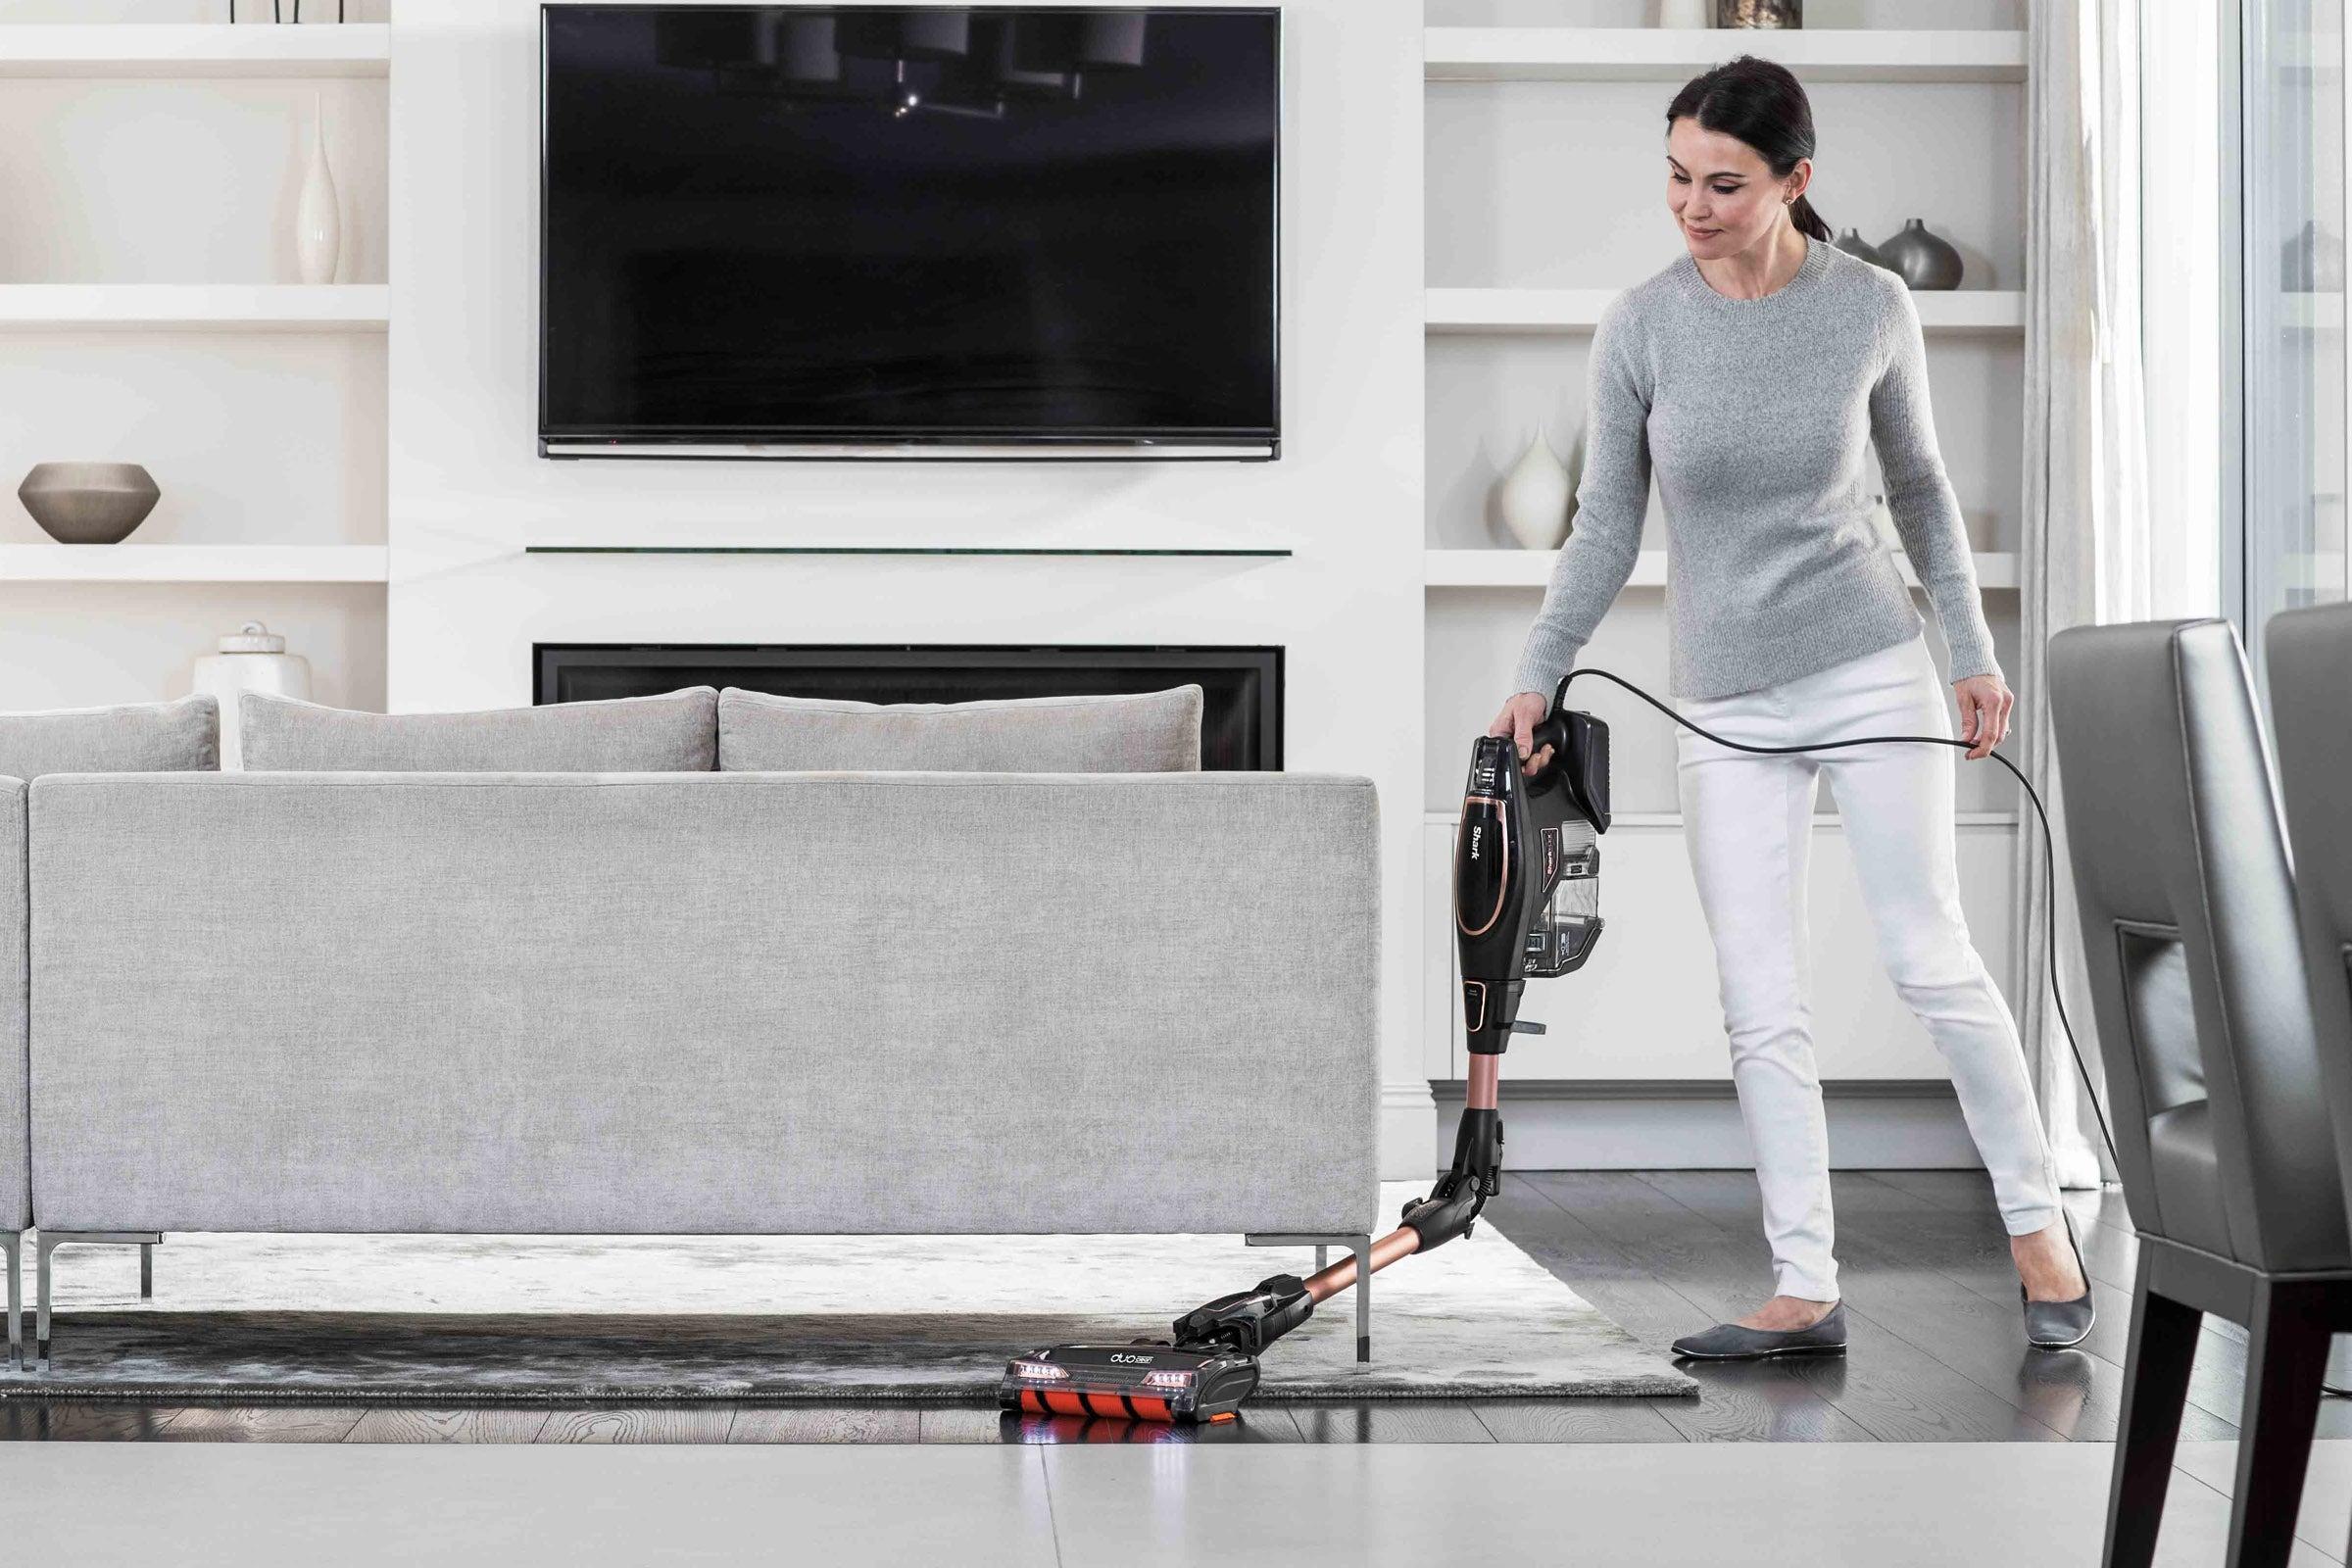 Shark Hv390ukt Duo Clean Truepet Bagless Vacuum Cleaner Review Trusted Reviews